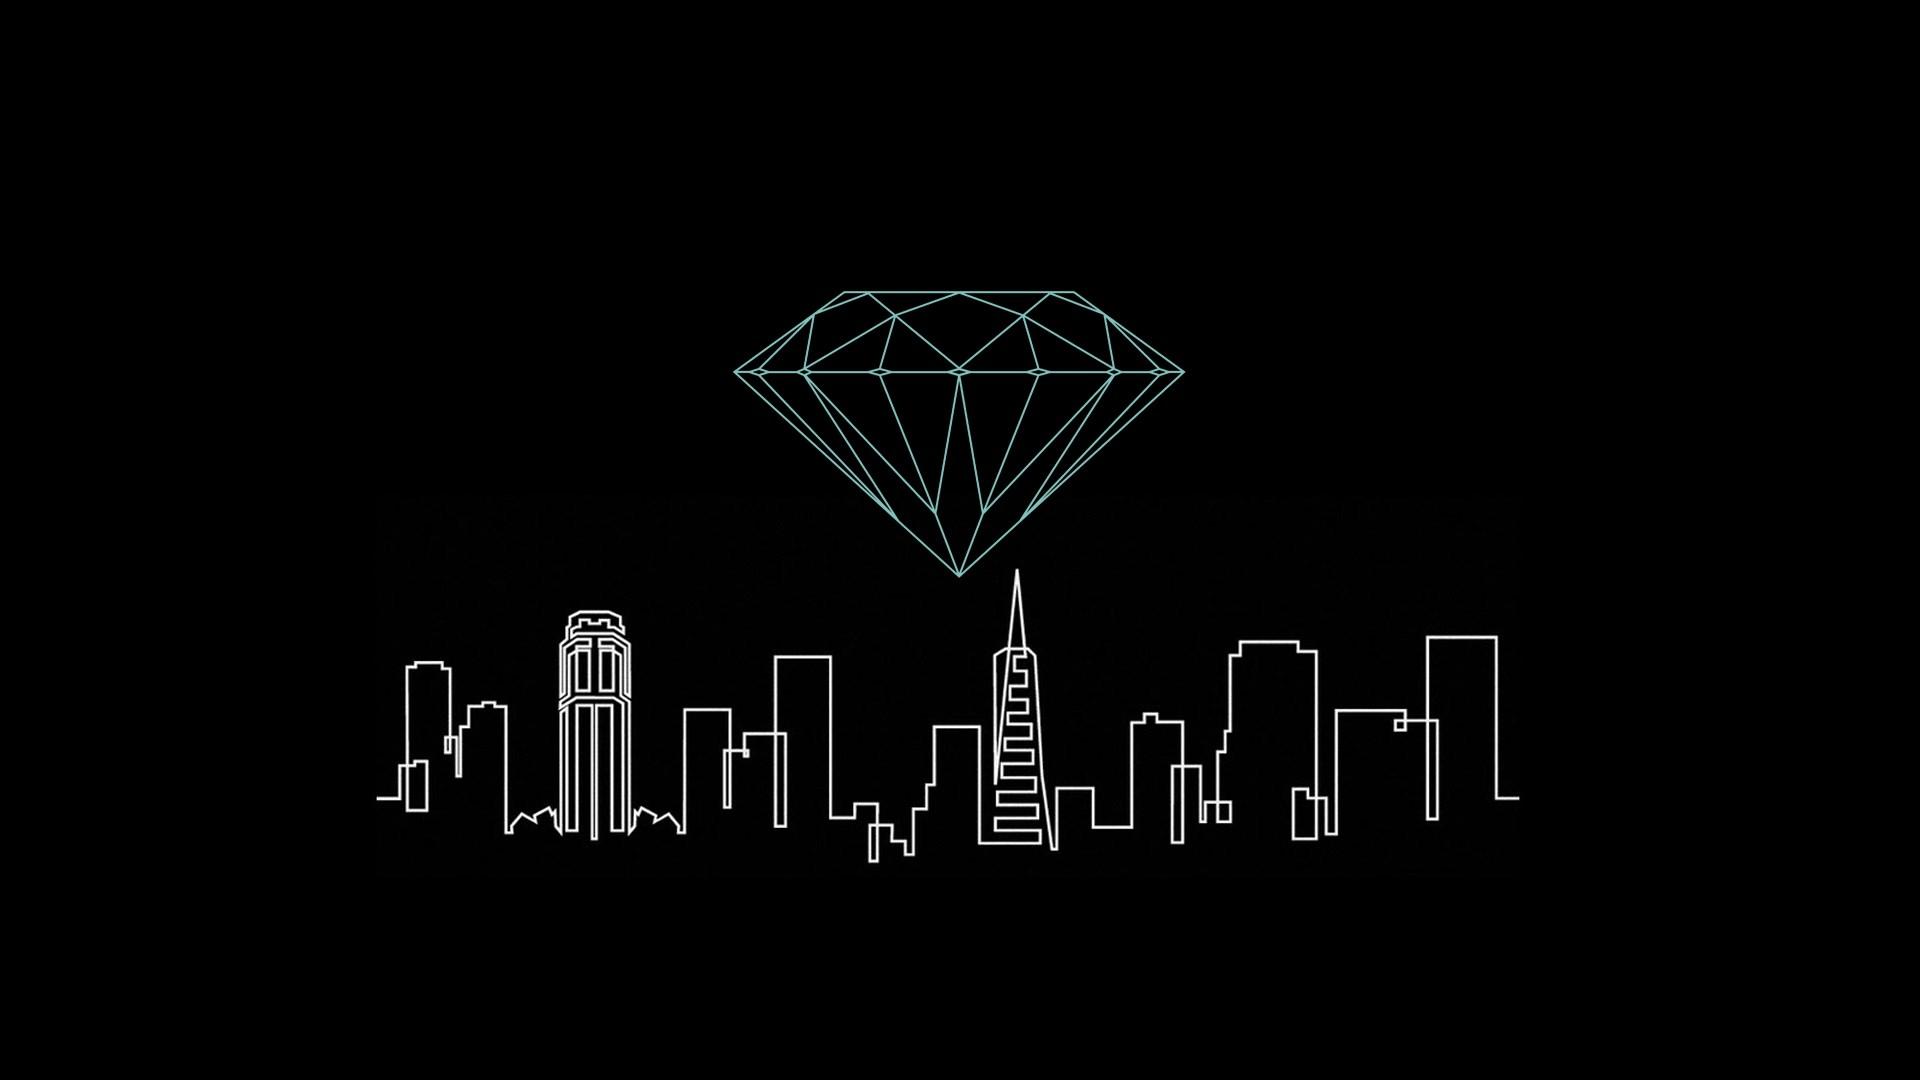 diamond-supply-wallpaper-wpc5804122